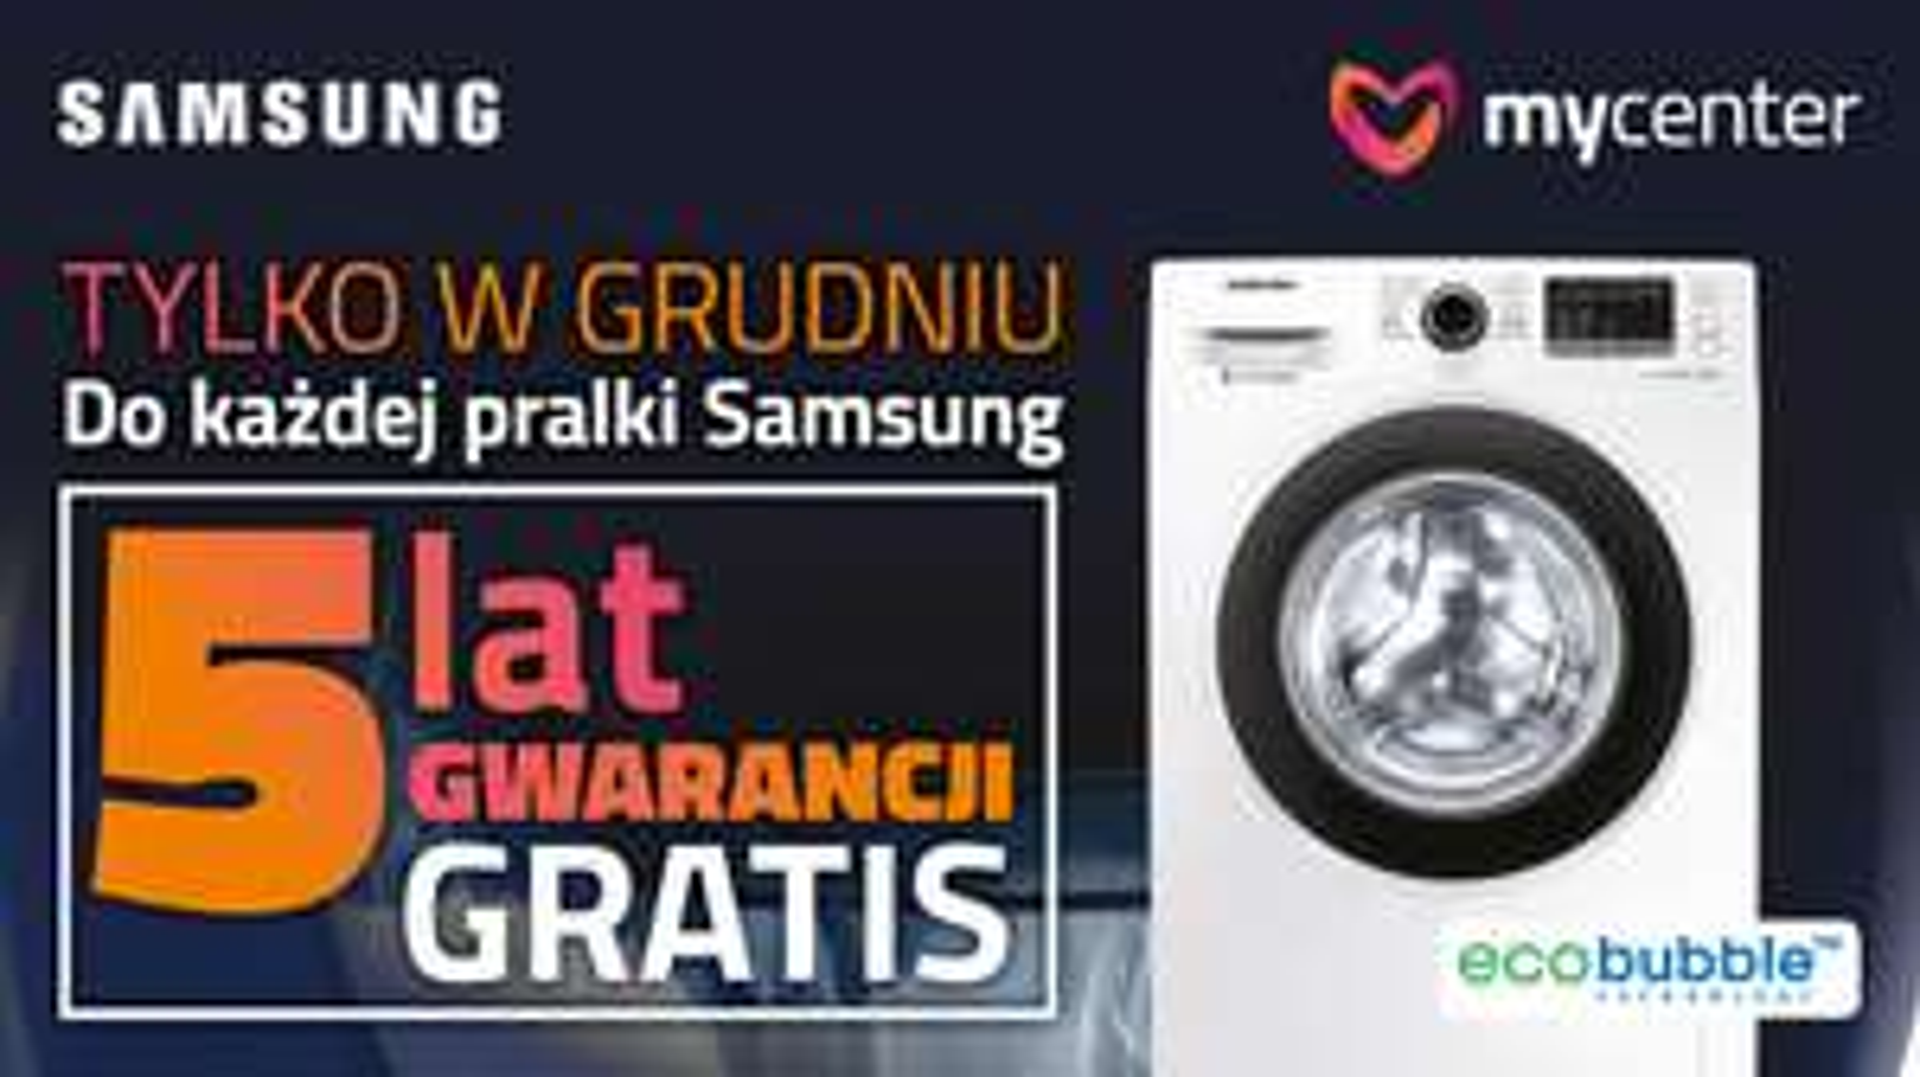 5 lat gwarancji na pralki Samsung @MyCenter